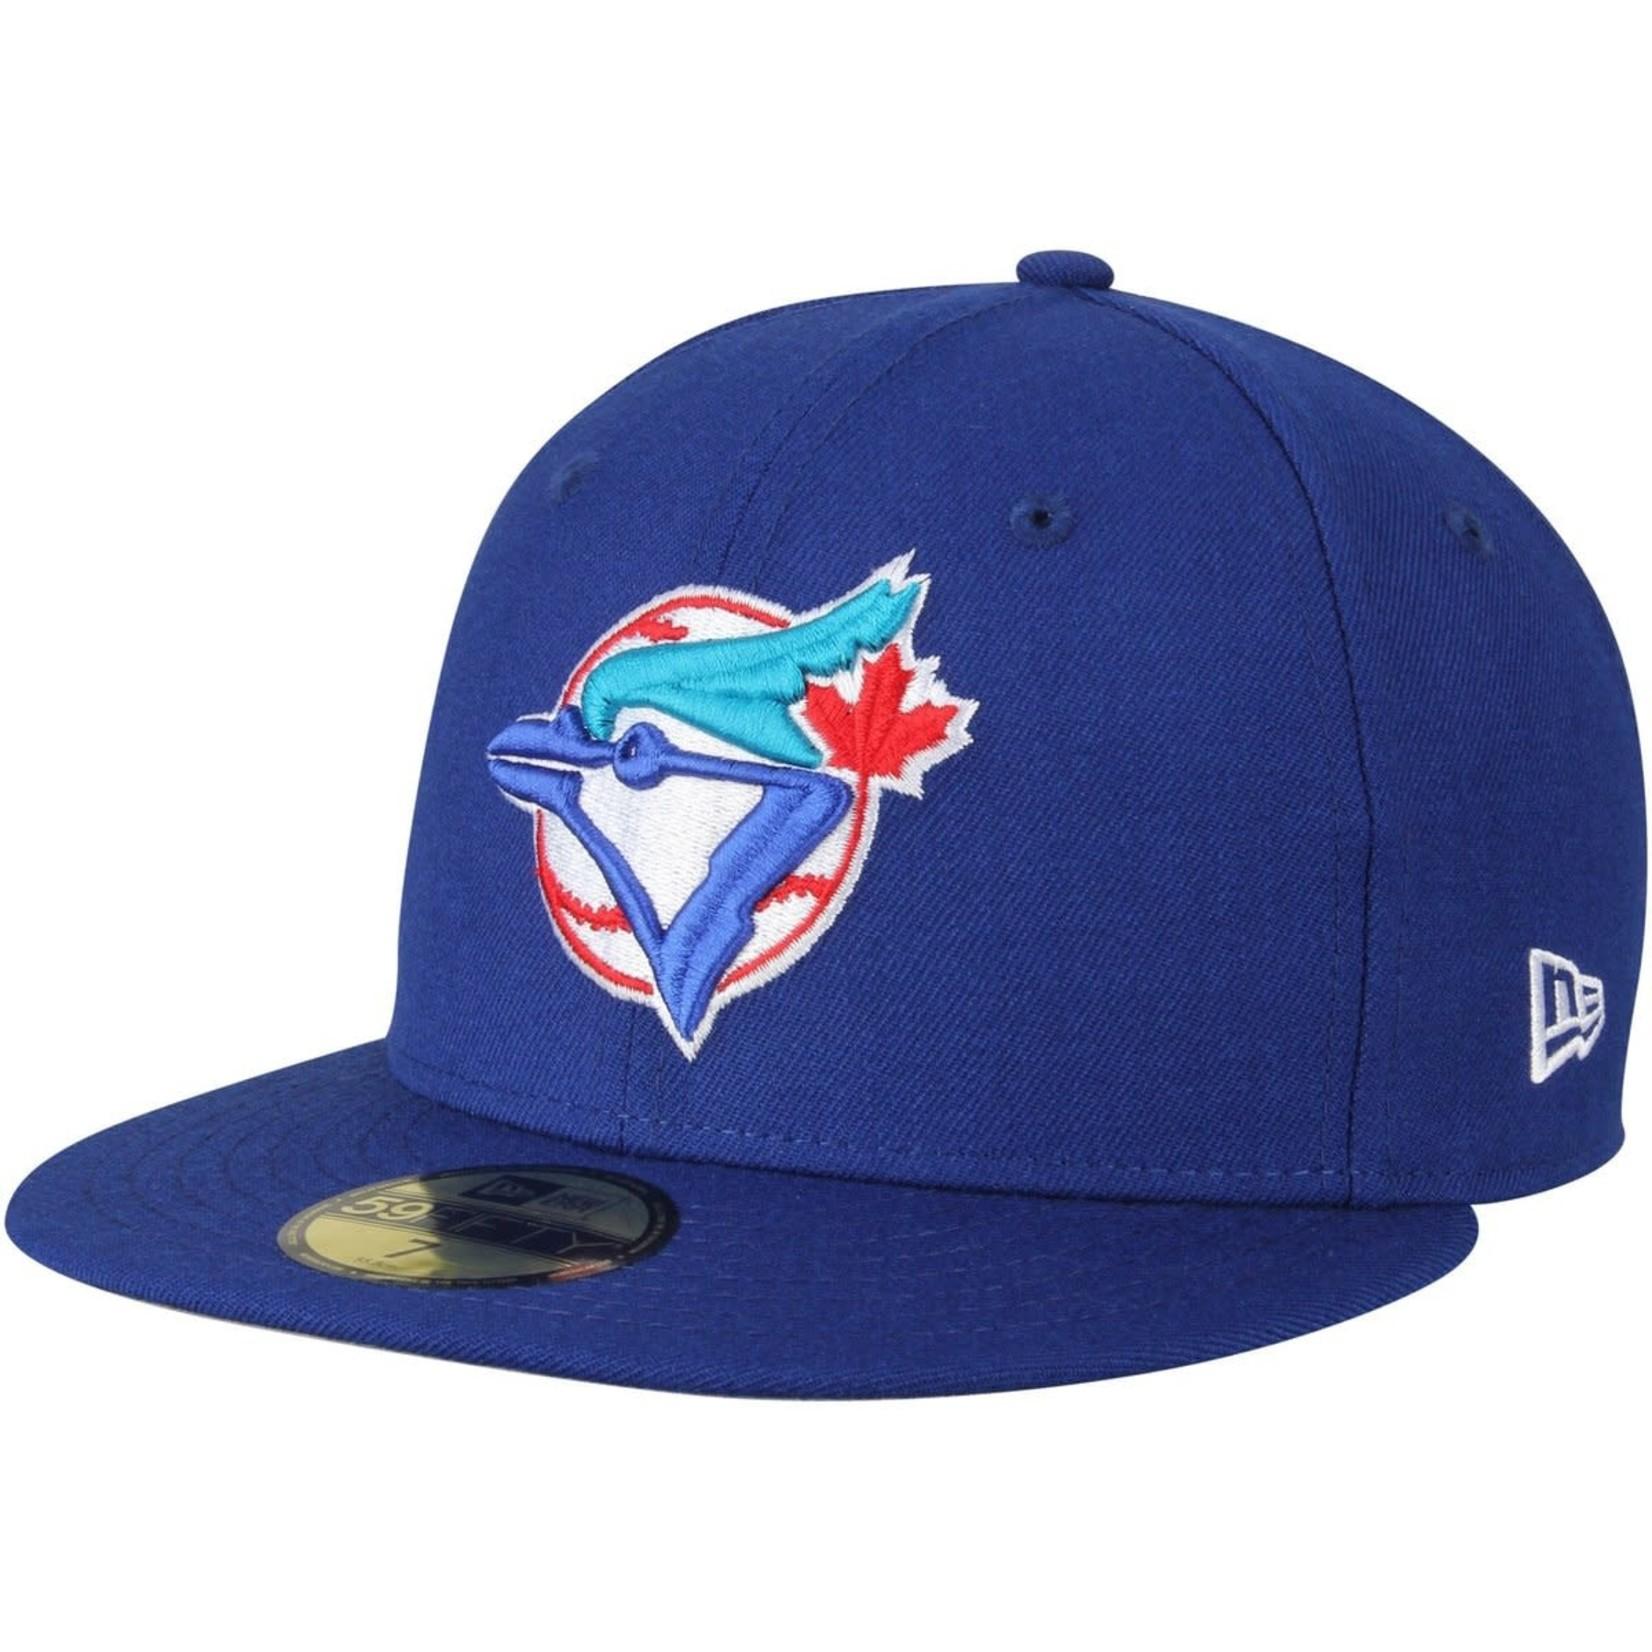 New Era New Era Hat, 5950 On-Field AC Cooperstown, MLB, Toronto Blue Jays 1989-91